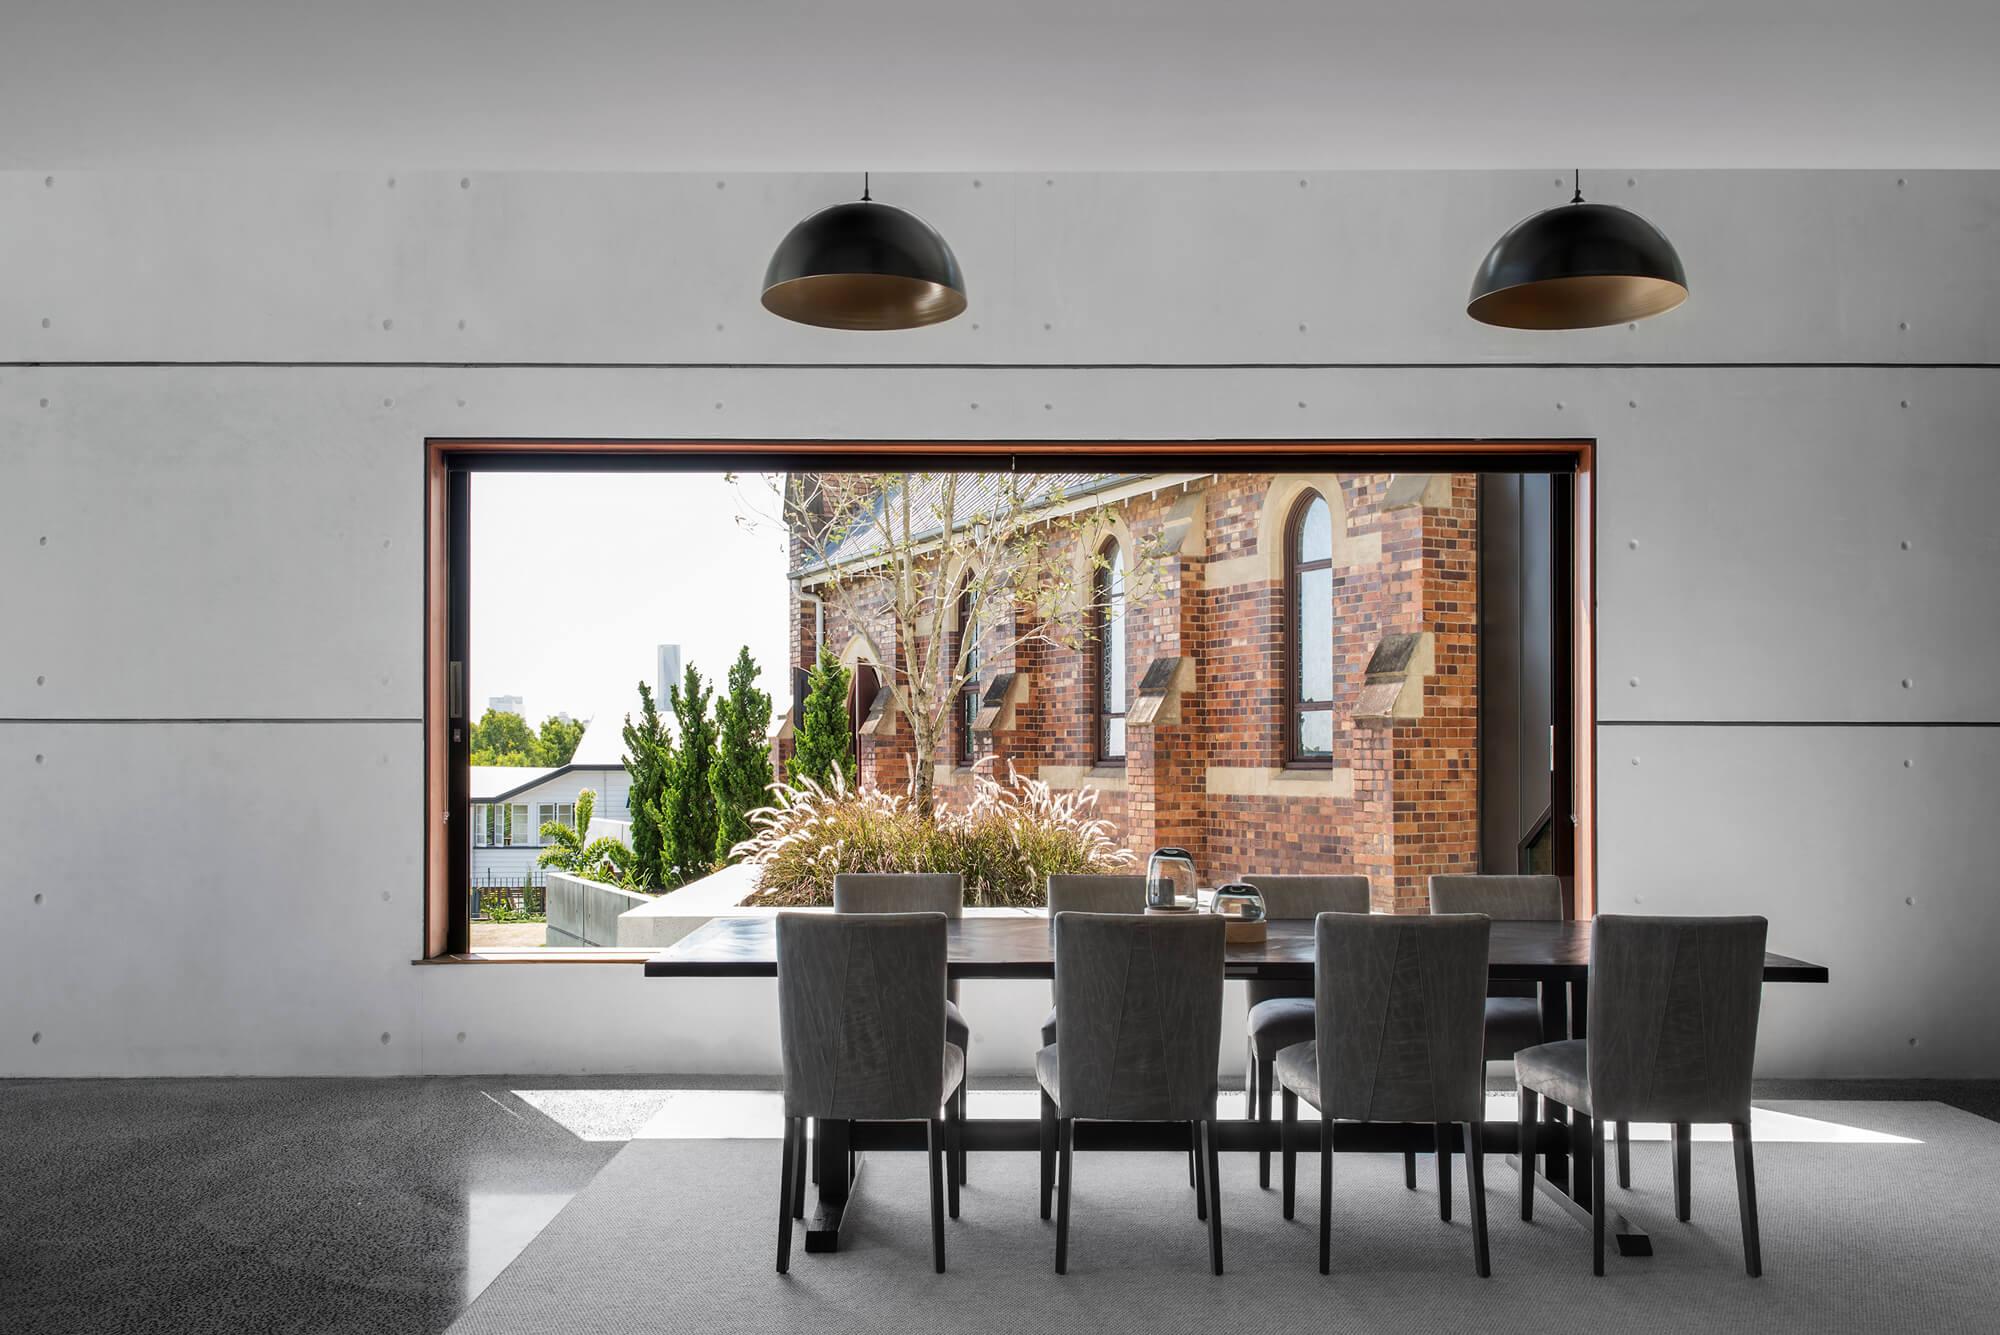 georgia-cannon-interior-designer-brisbane-project-church-house-11.jpg